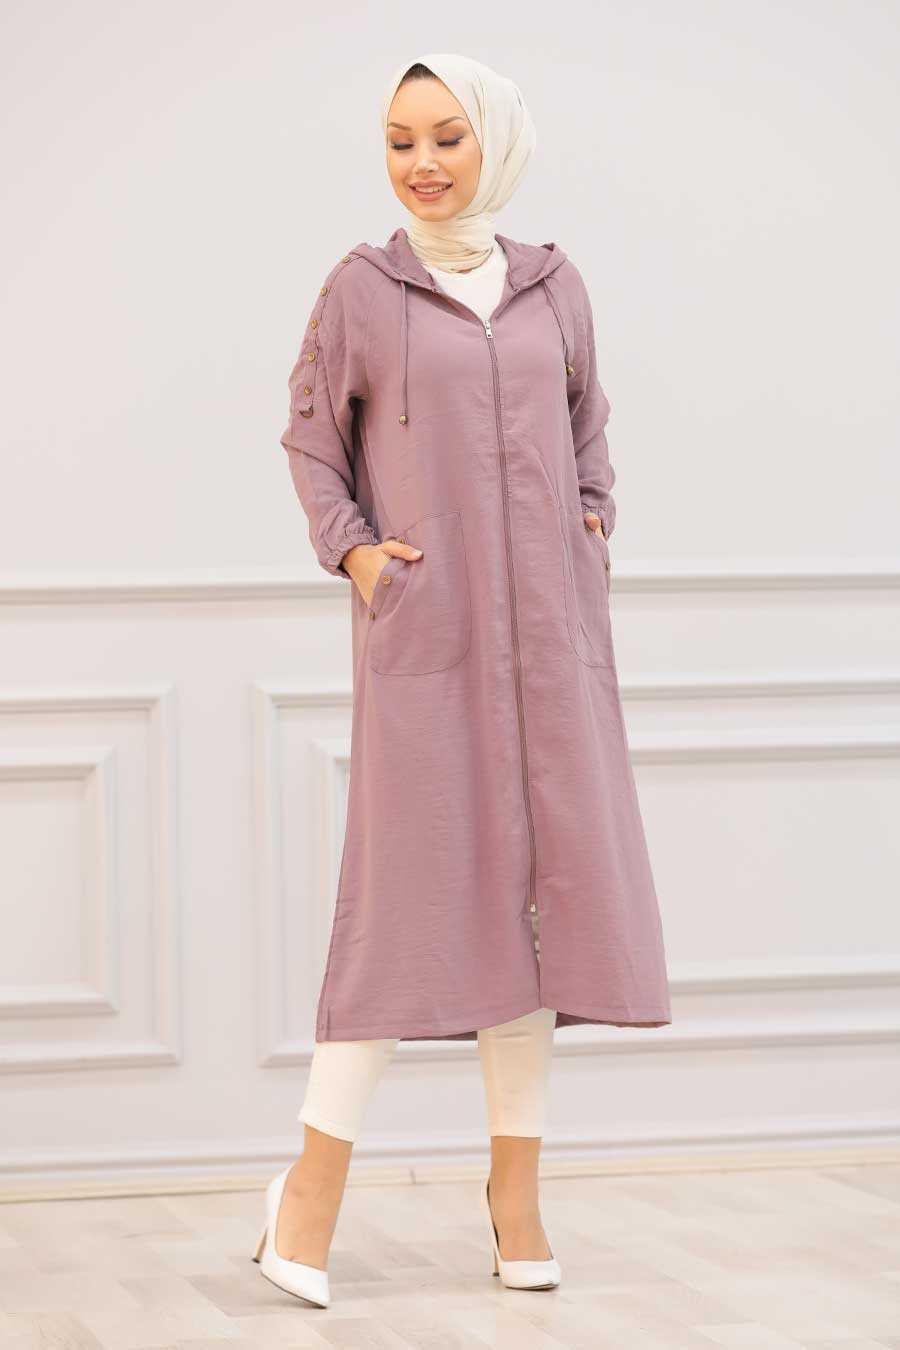 Dusty Rose Hijab Coat 14650GK